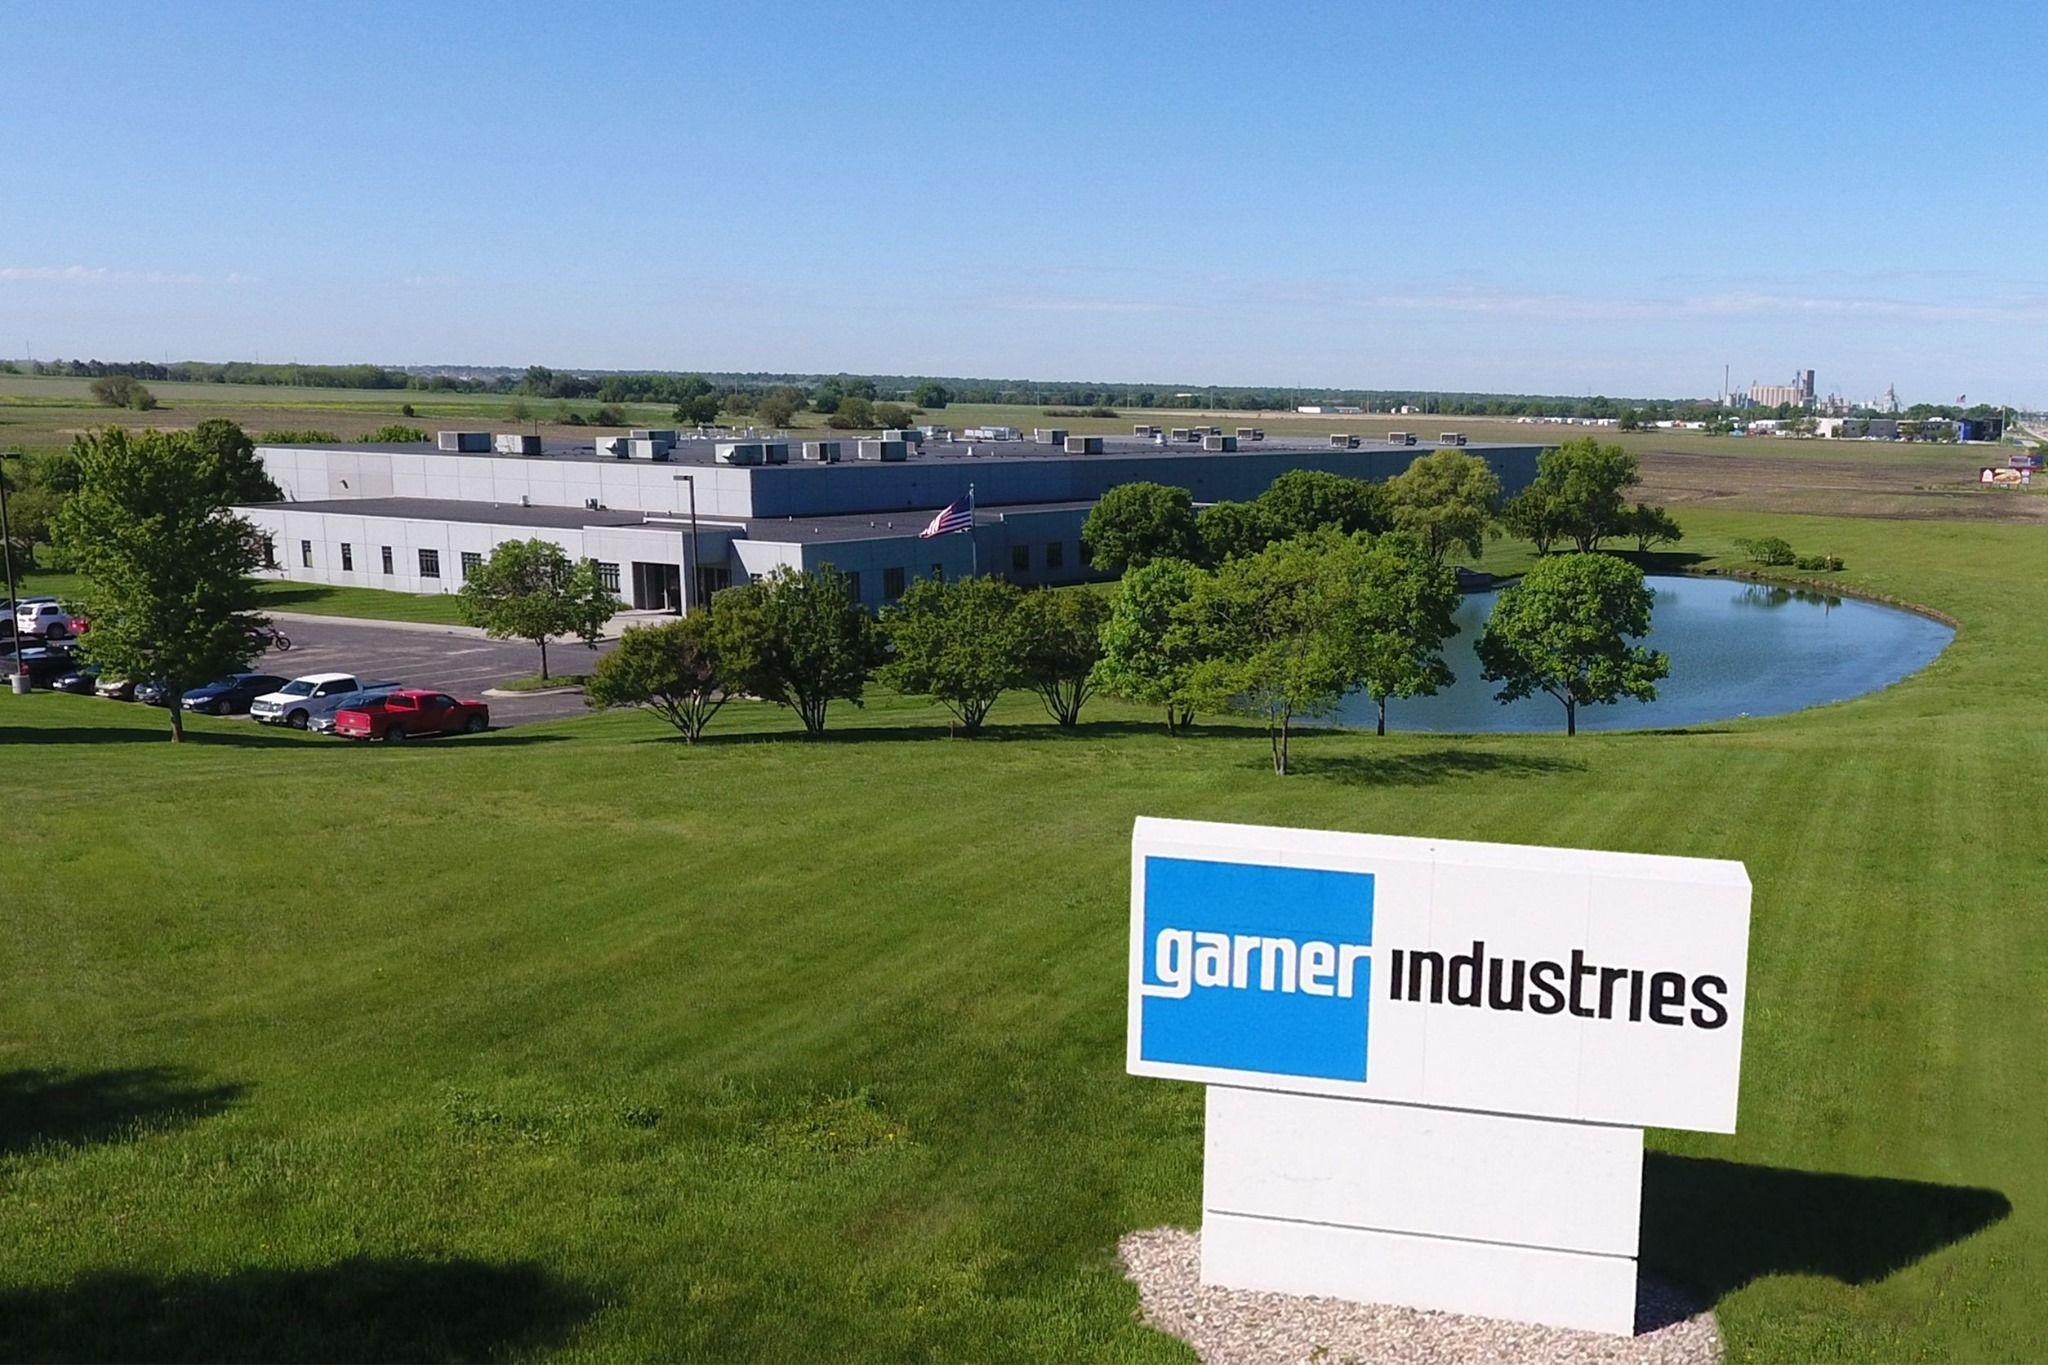 Garner Industries Named Visionary Partner